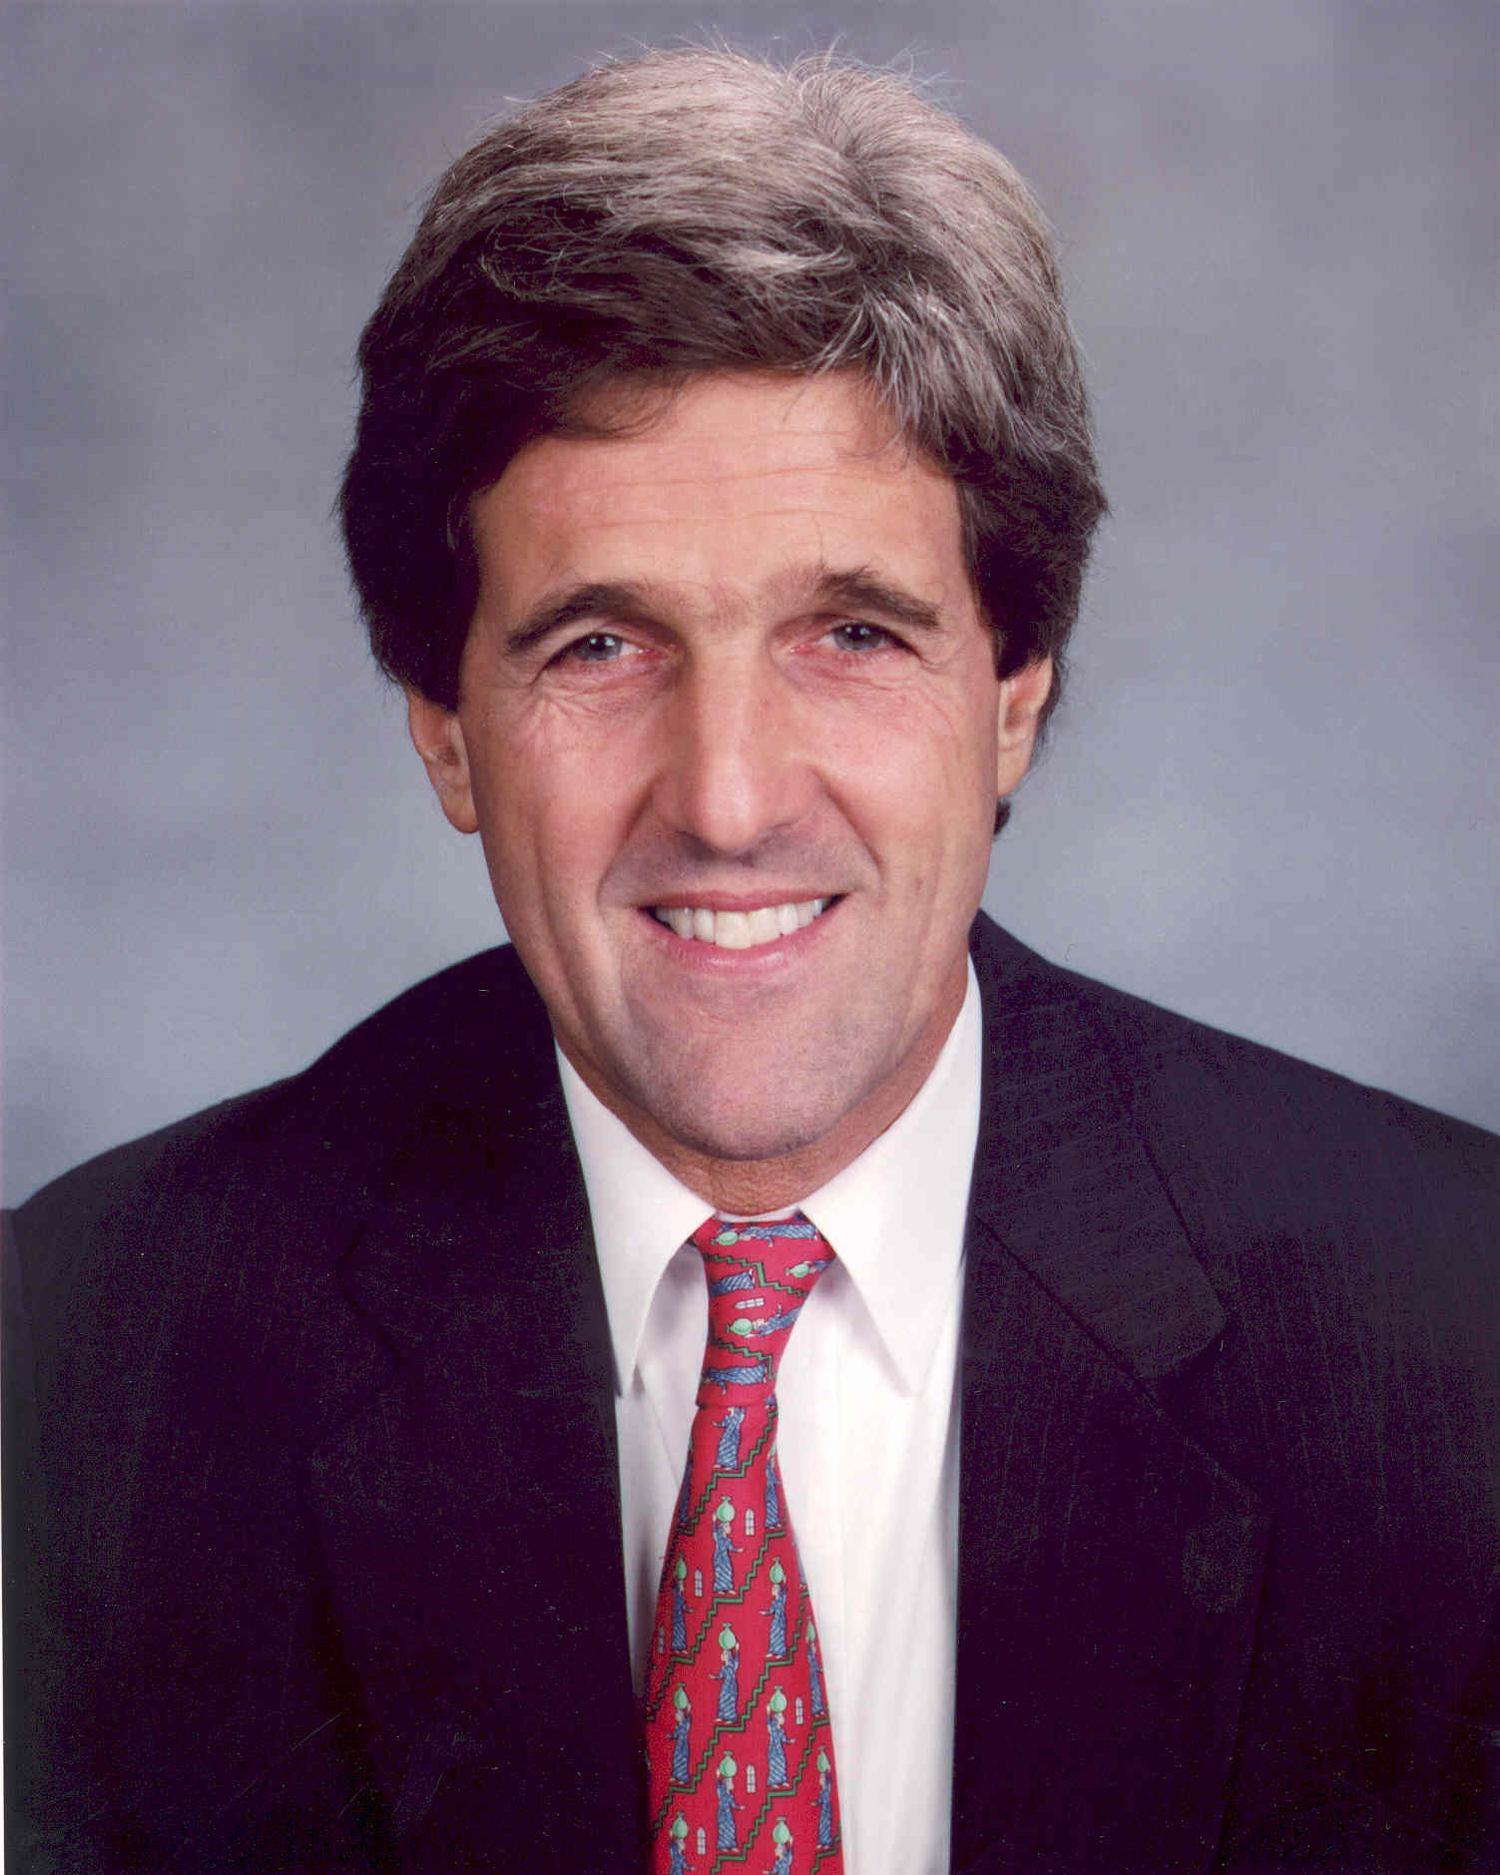 JohnKerry